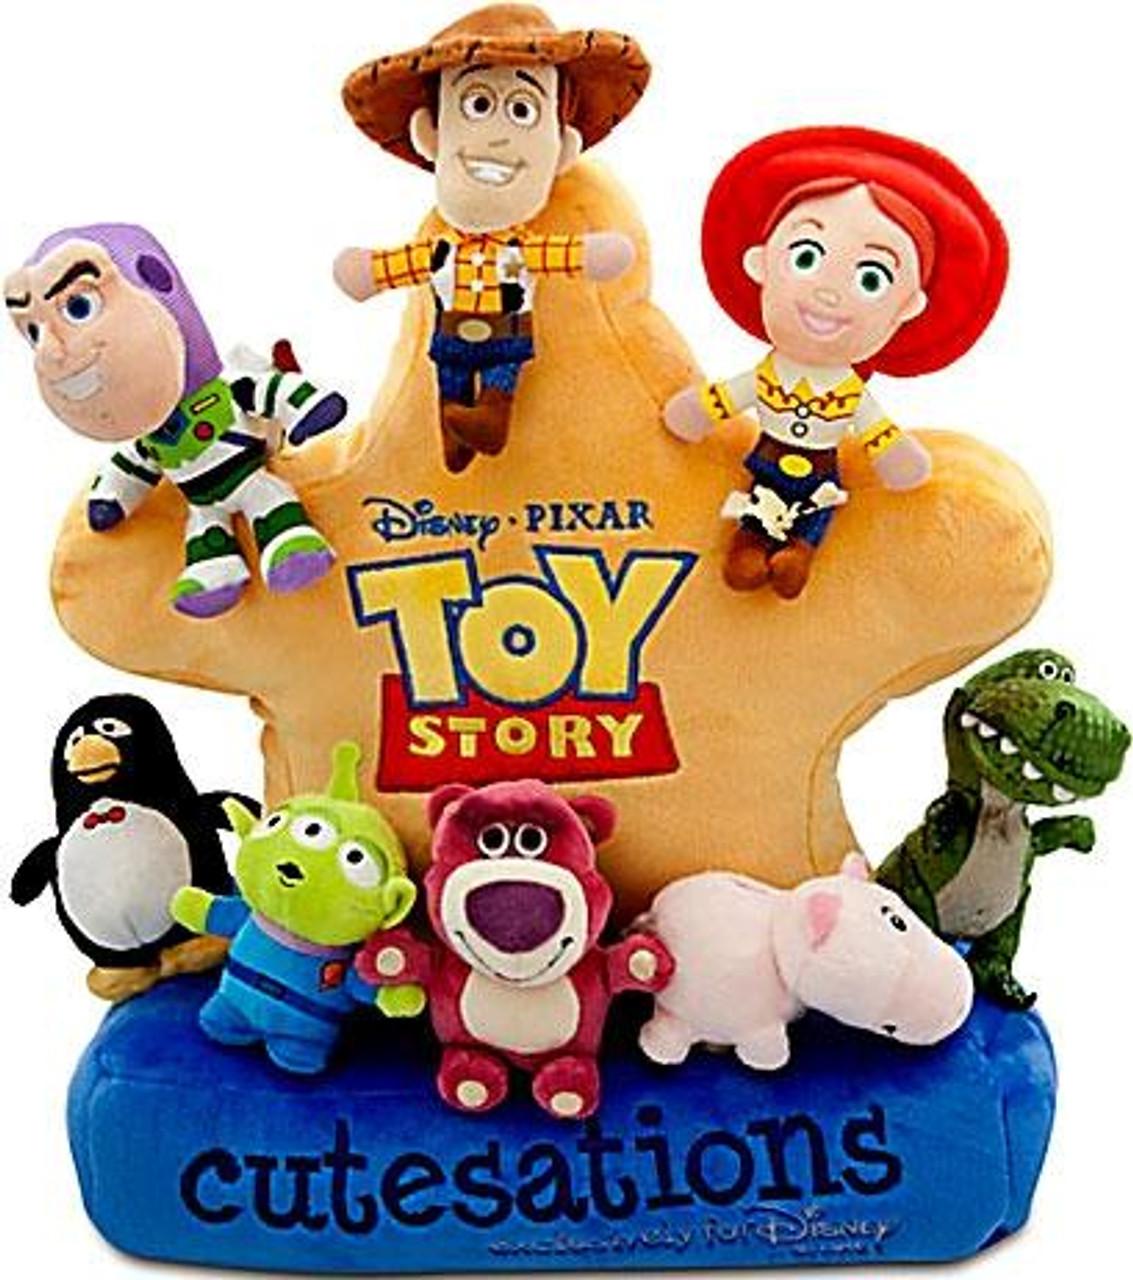 Disney Toy Story 3 Cutestation Sheriff Badge Exclusive Plush